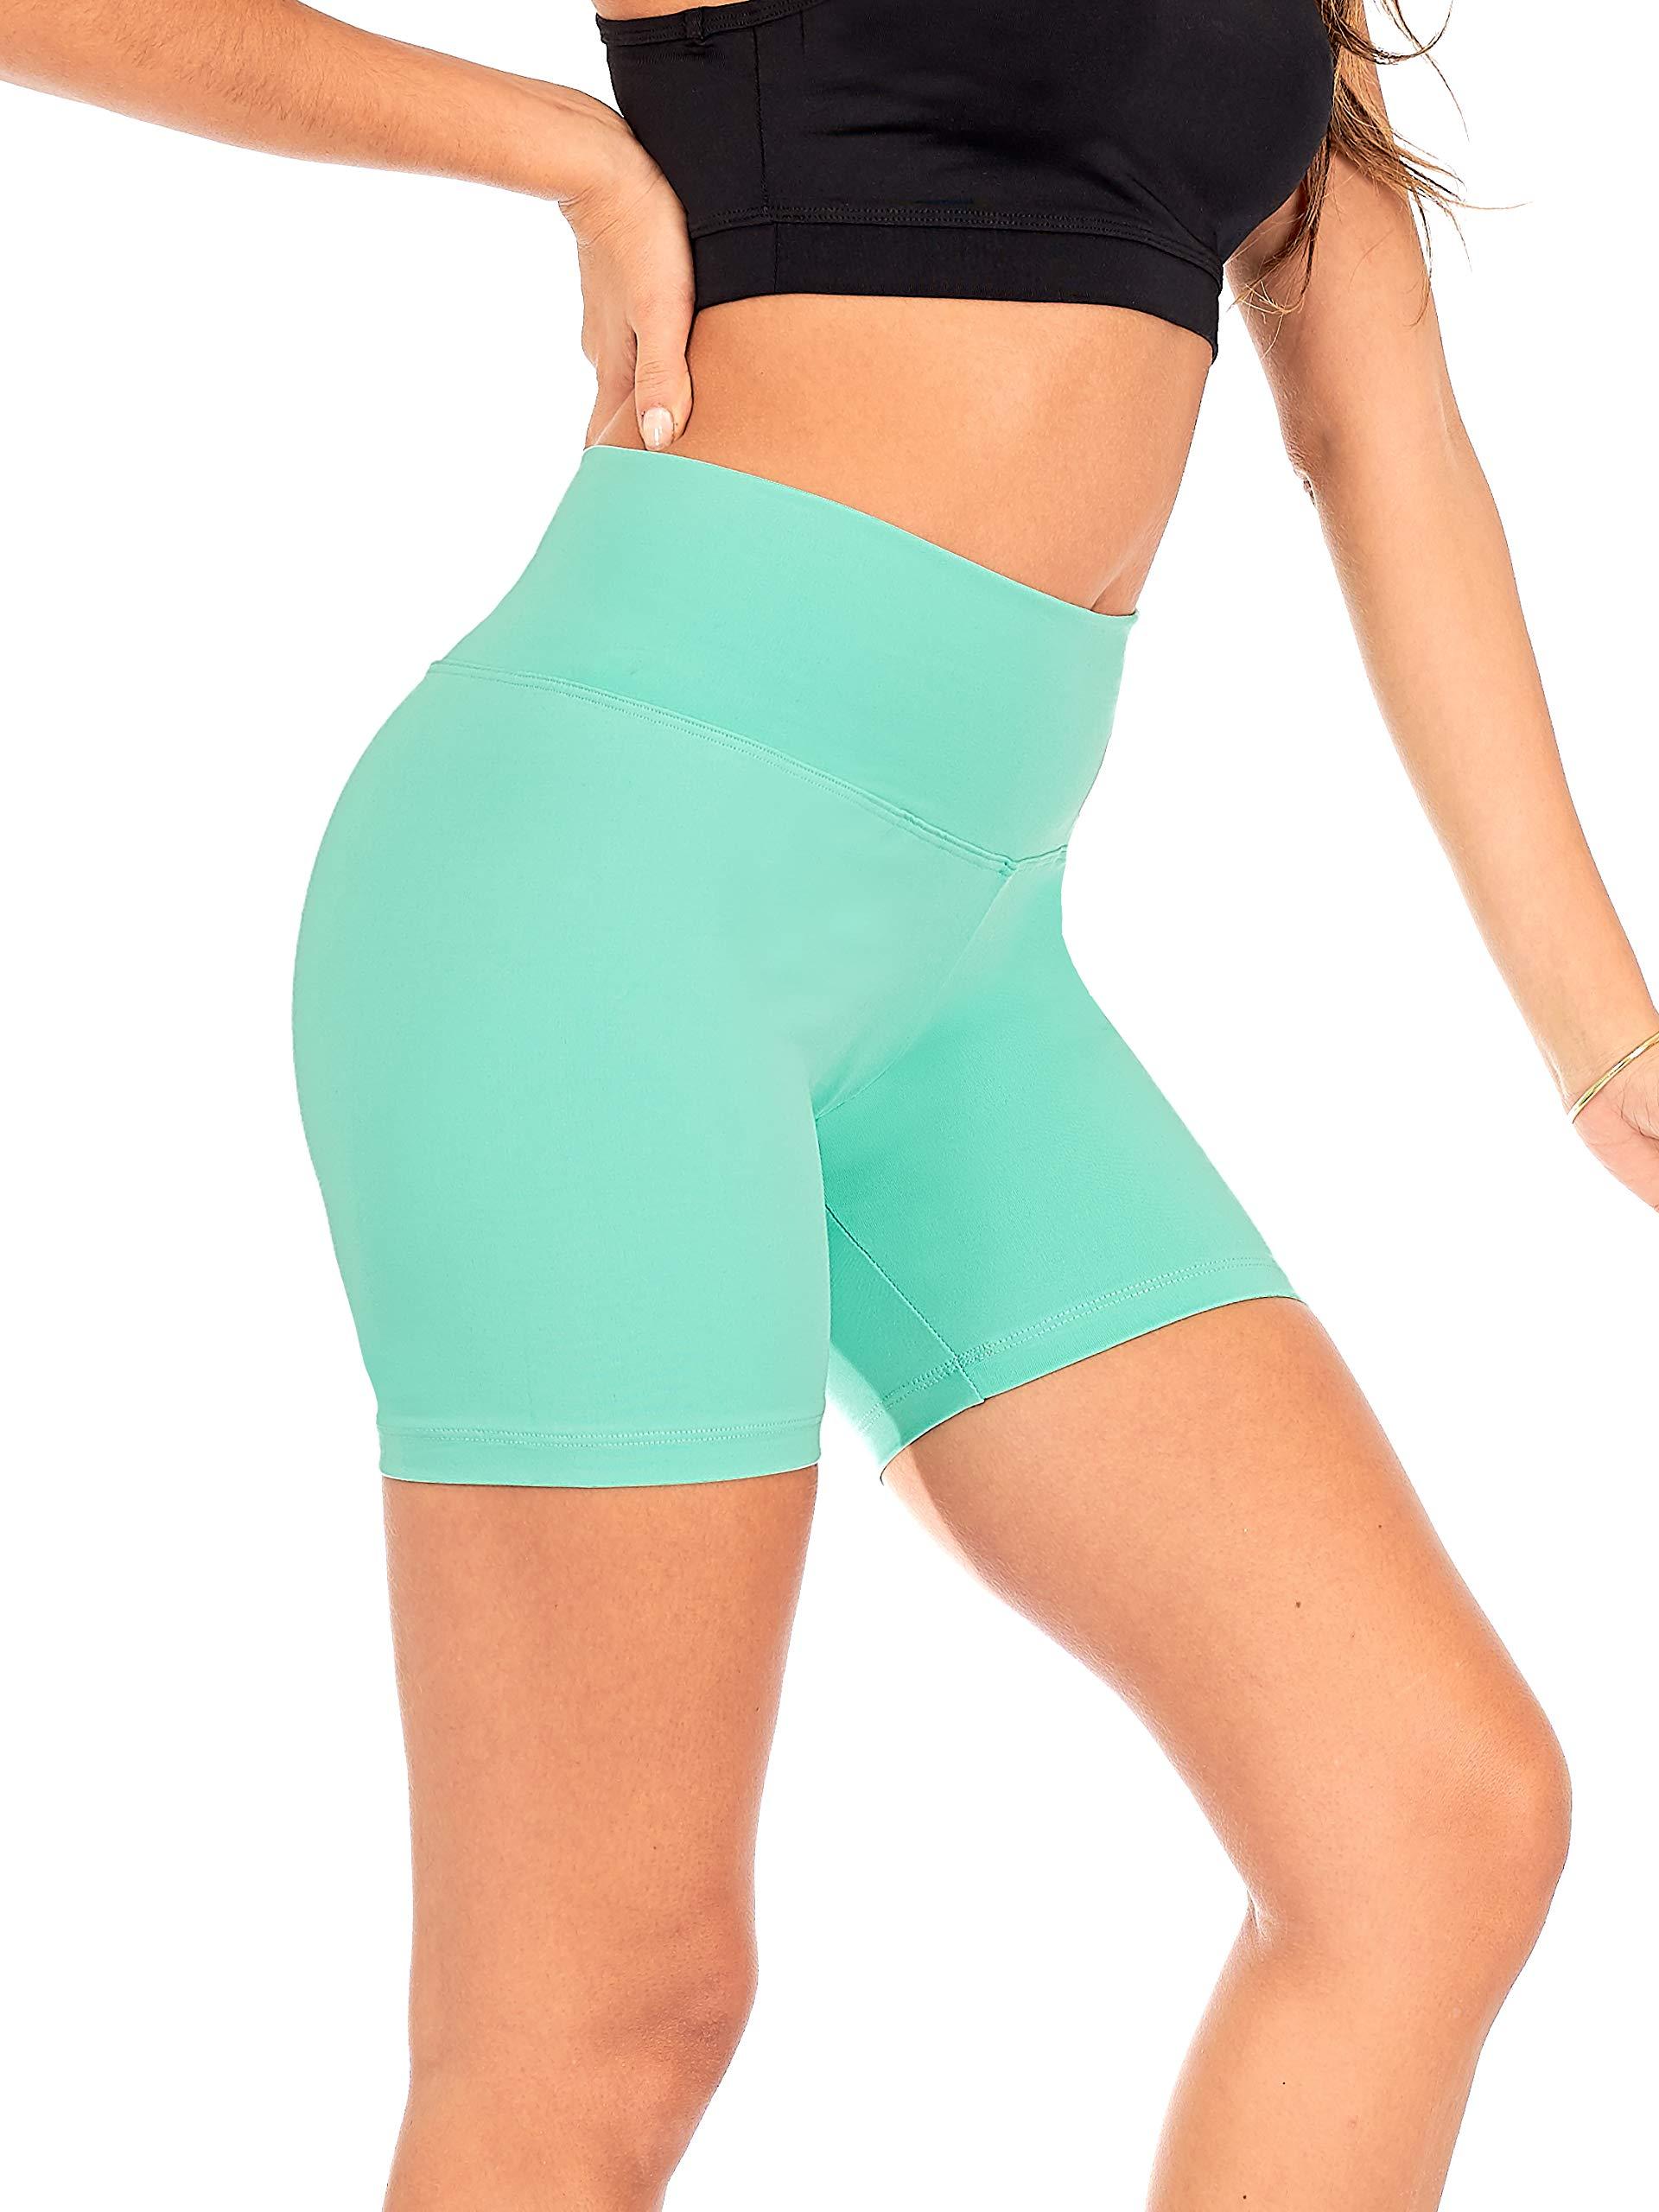 DEAR SPARKLE Yoga Shorts Running Short for Women High Waist Workout 5 Inch Bike Shorts with Pockets (S14)